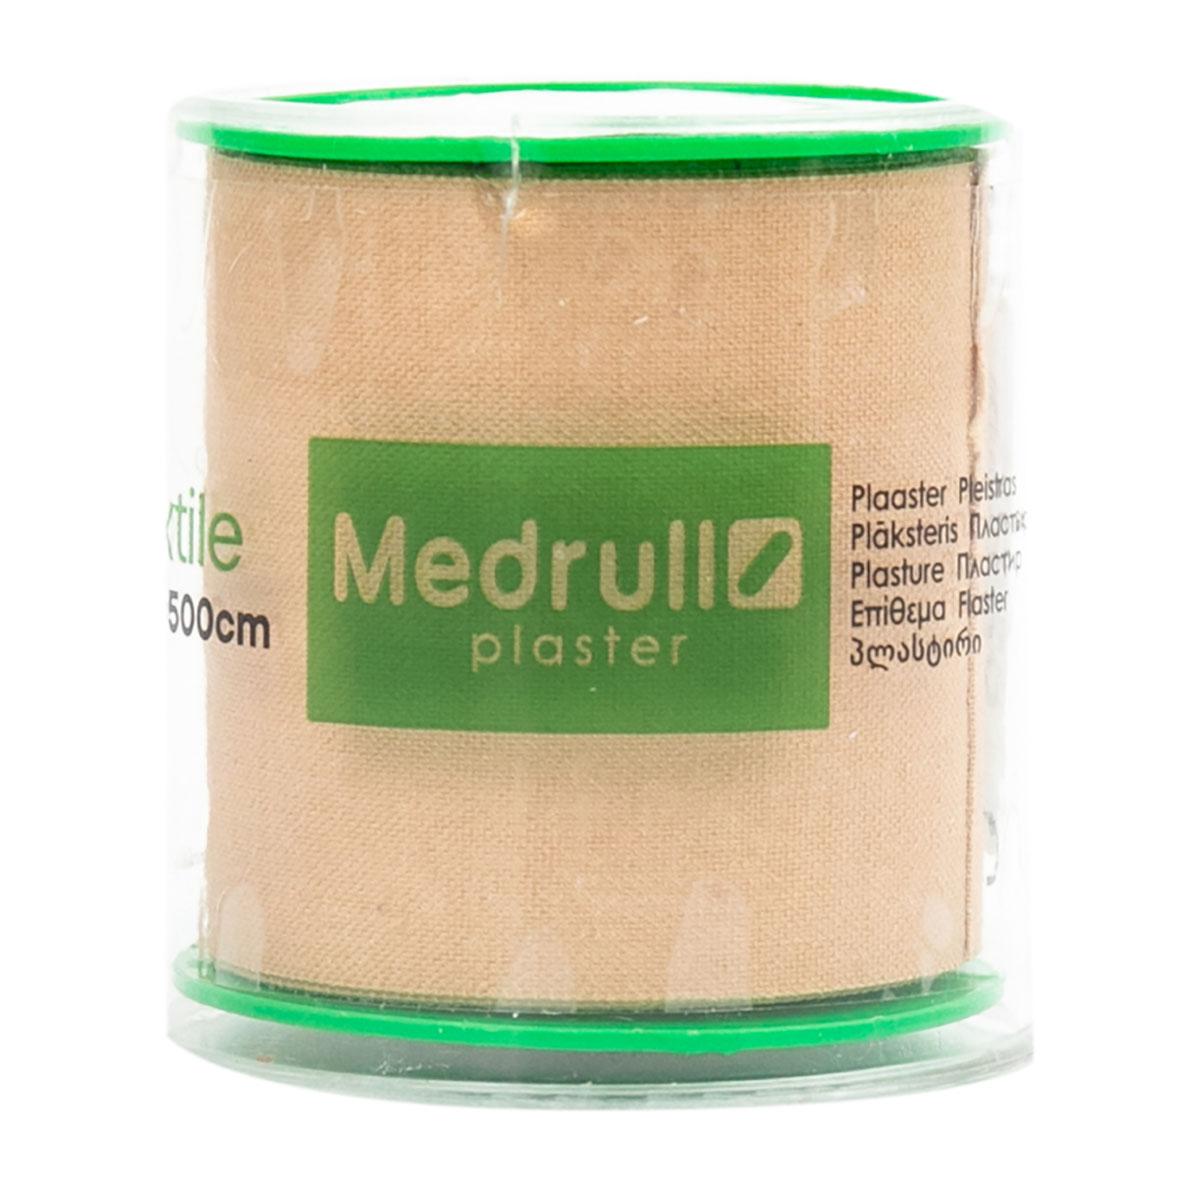 Medrull Textile лейкопластырь